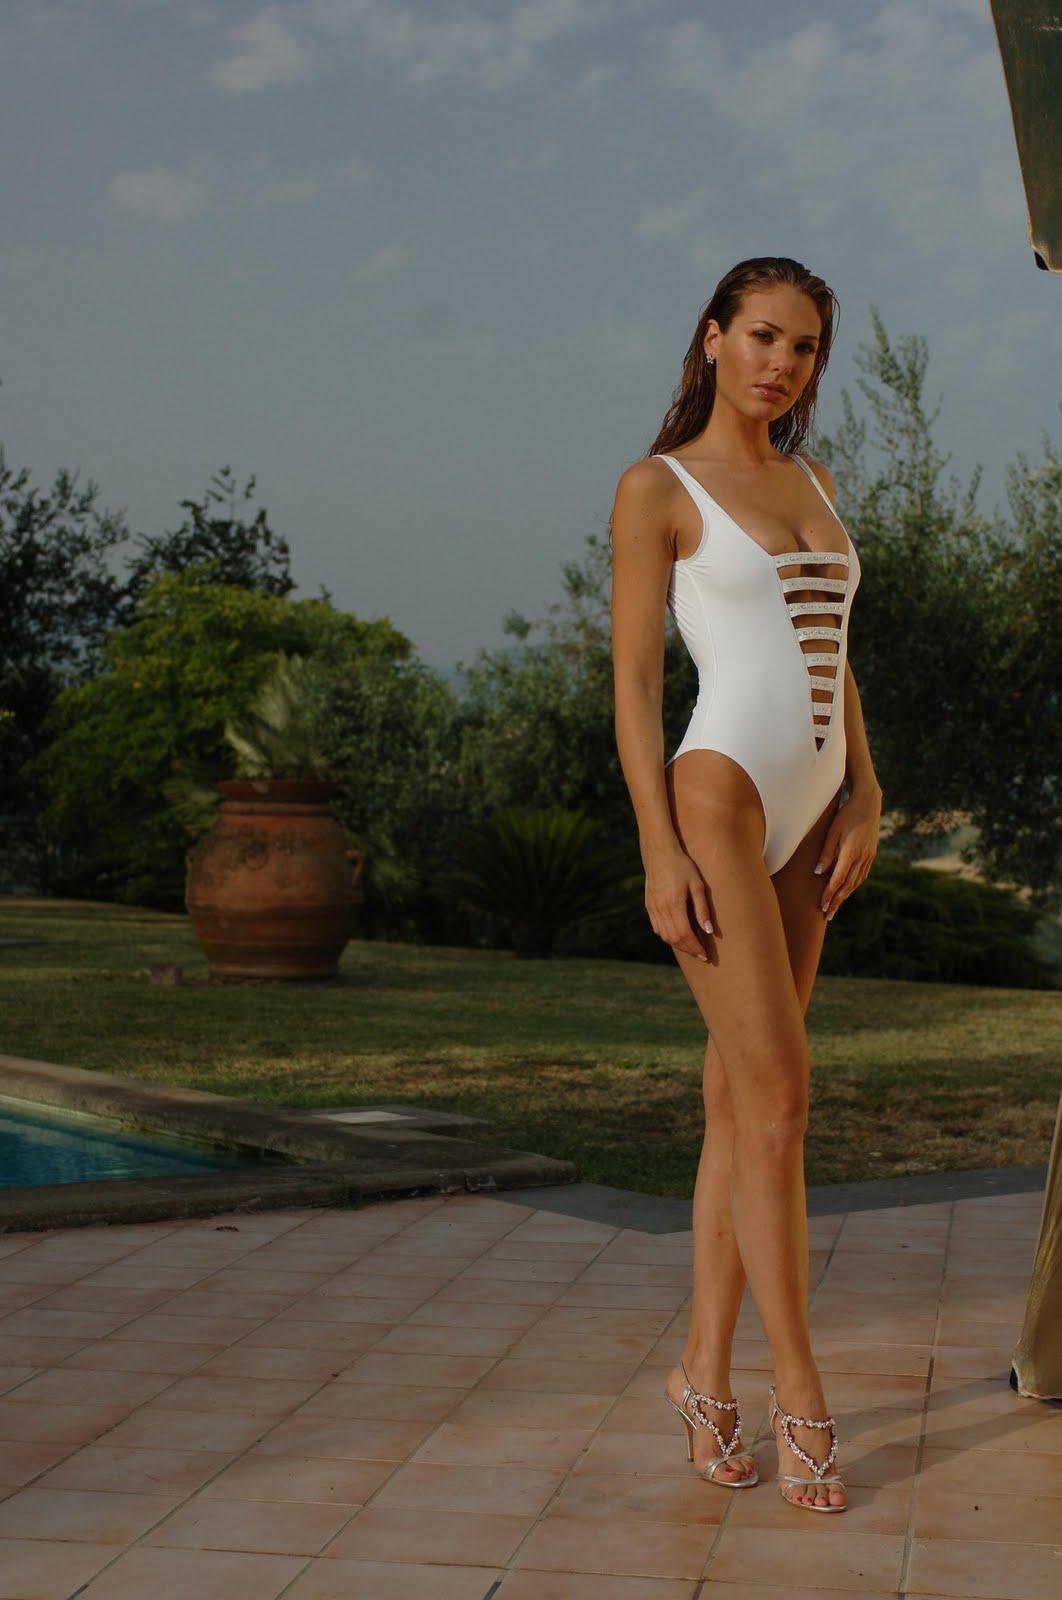 http://3.bp.blogspot.com/-xBlEd8HwGh8/Ttpuj3ZvXkI/AAAAAAAAAKw/IlYPIpqKF94/s1600/Ilary%2BBlasi%2B%257E%2BSwimwear%2Bphotoshoot%2B35.jpg